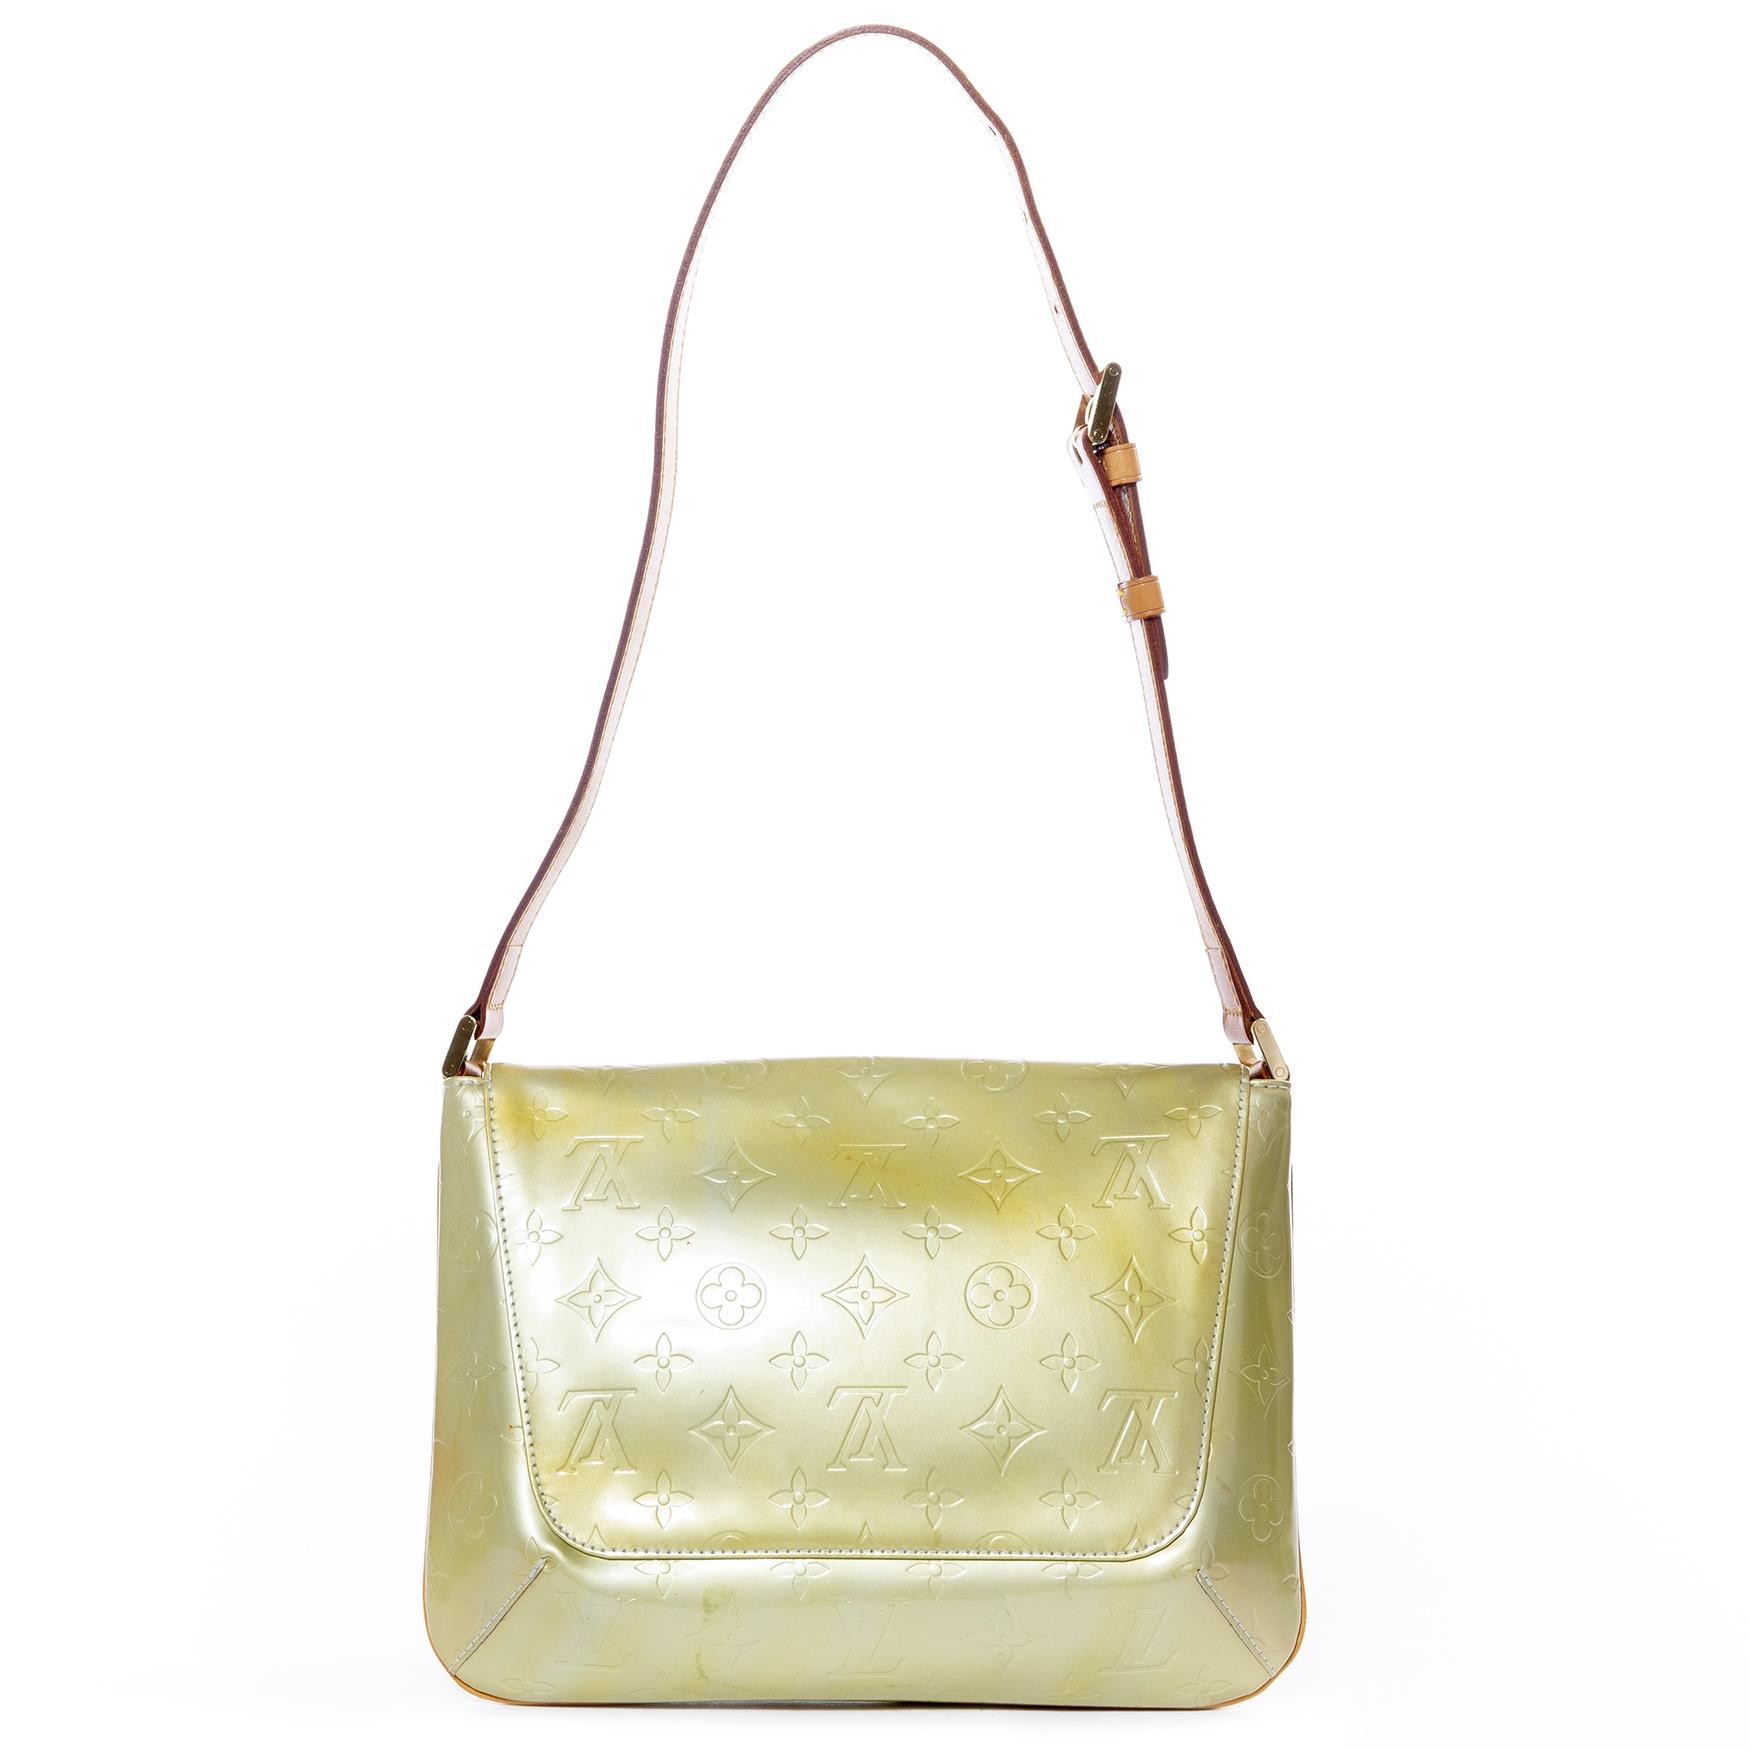 ... louis vuitton yellow monogram vernis thompson street bag now for sale  at labellov vintage fashion webshop 70c56ee5fdff4